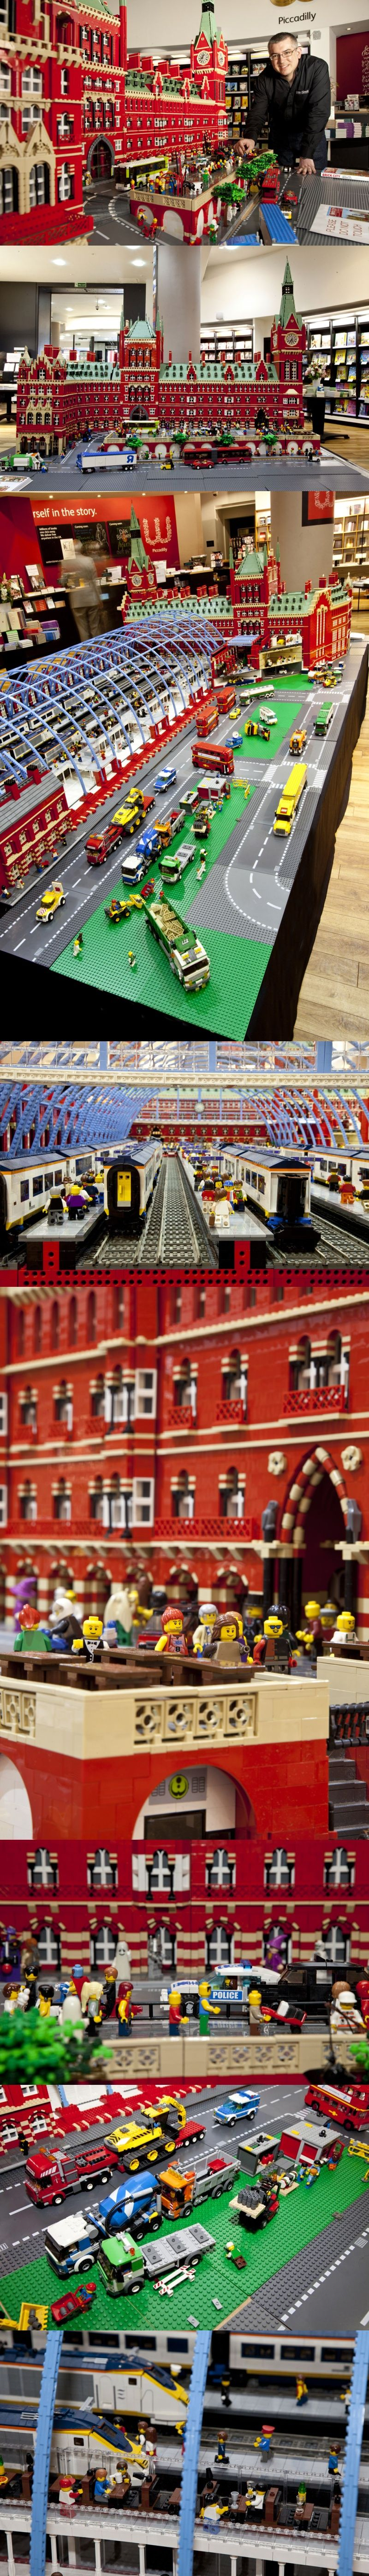 Incredible LEGO St Pancras International Station LEGO station